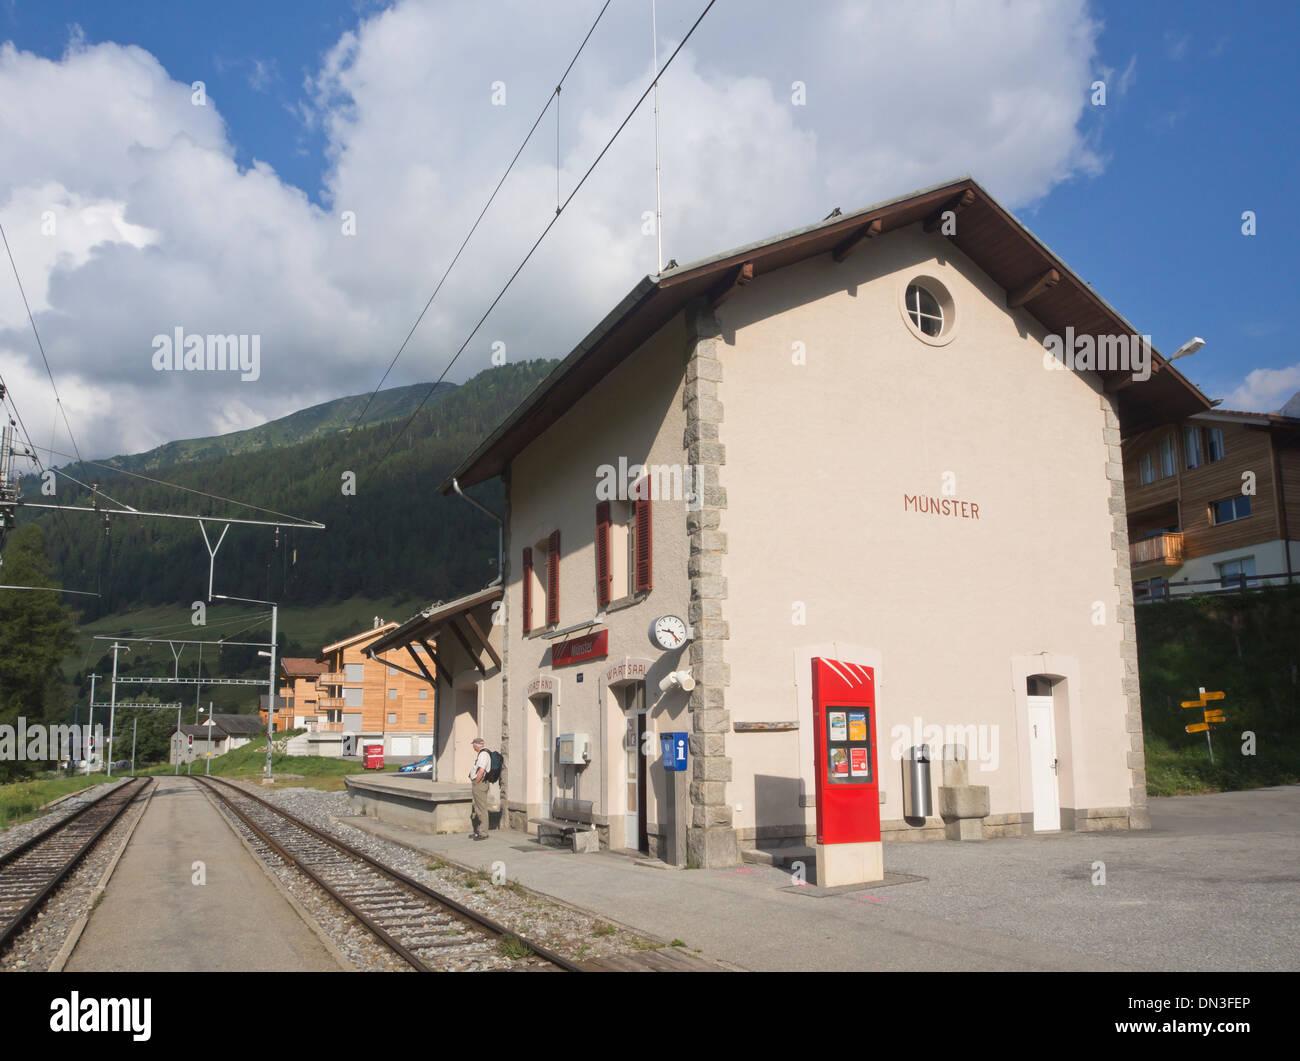 Railway station on the Matterhorn Gothard bahn, Glacier express, in the village Munster in Switzerland - Stock Image